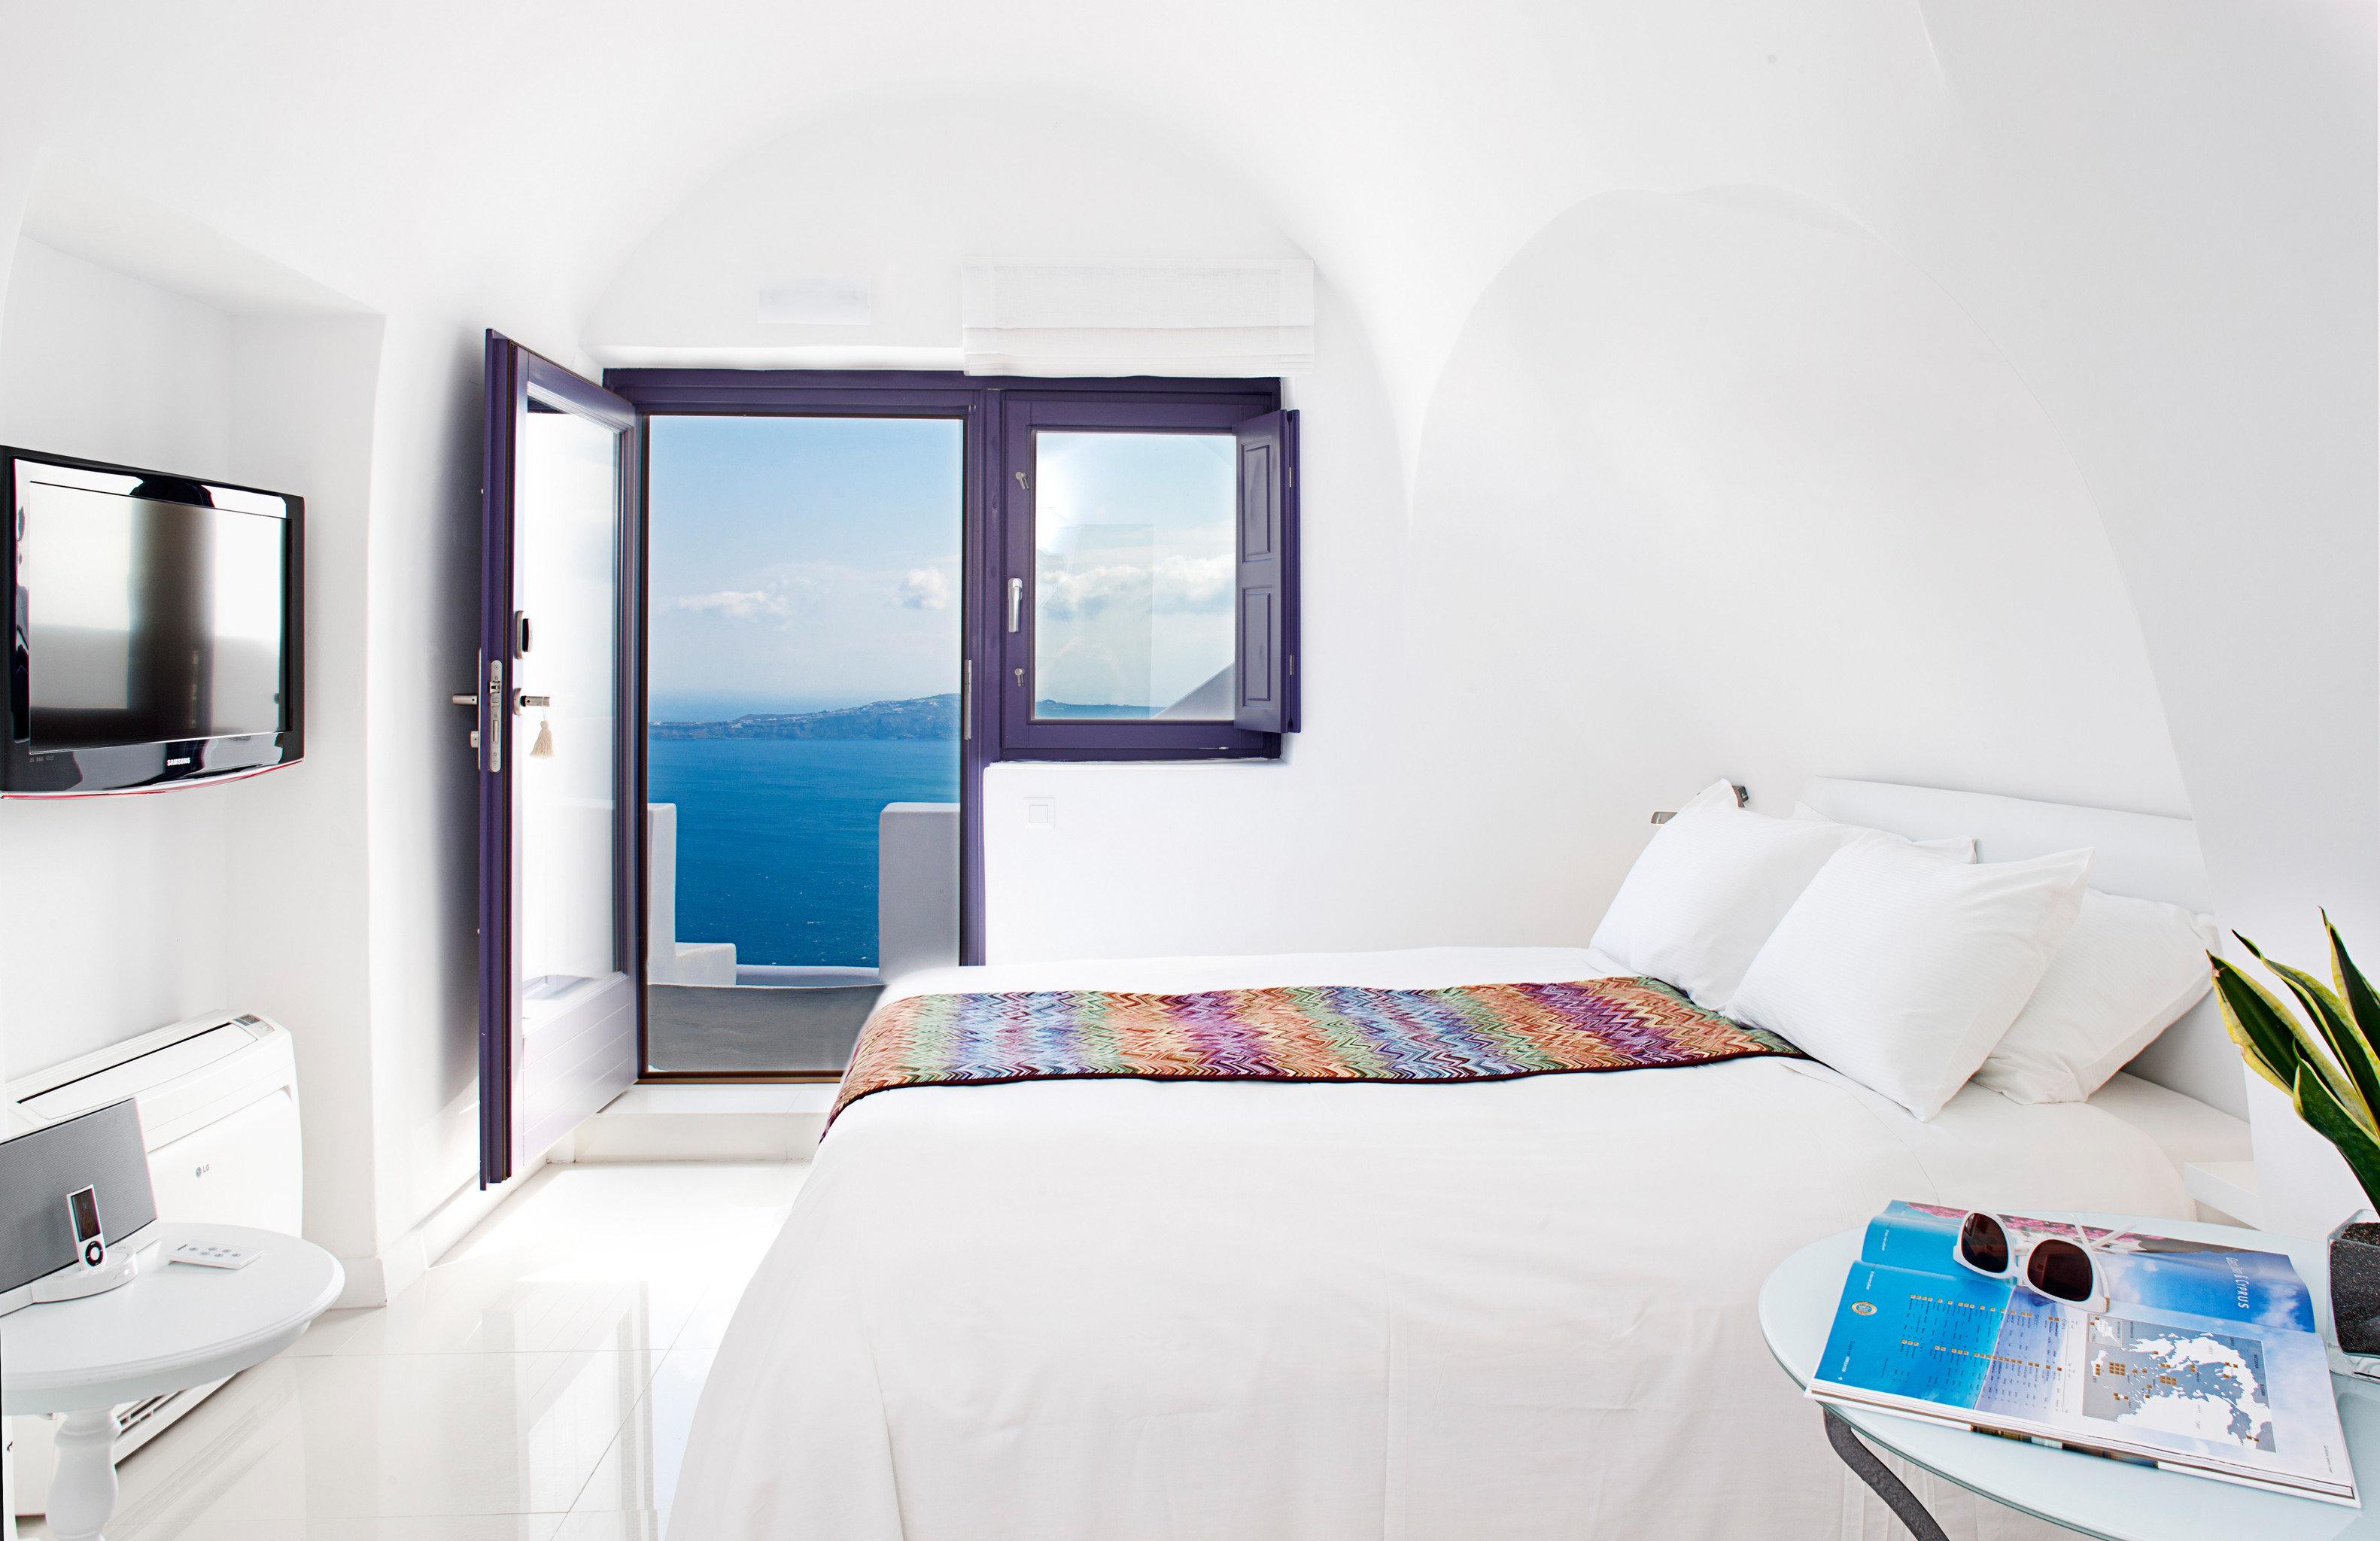 Beachfront Bedroom Lounge Luxury Scenic views Suite property cottage scene home pillow living room Villa